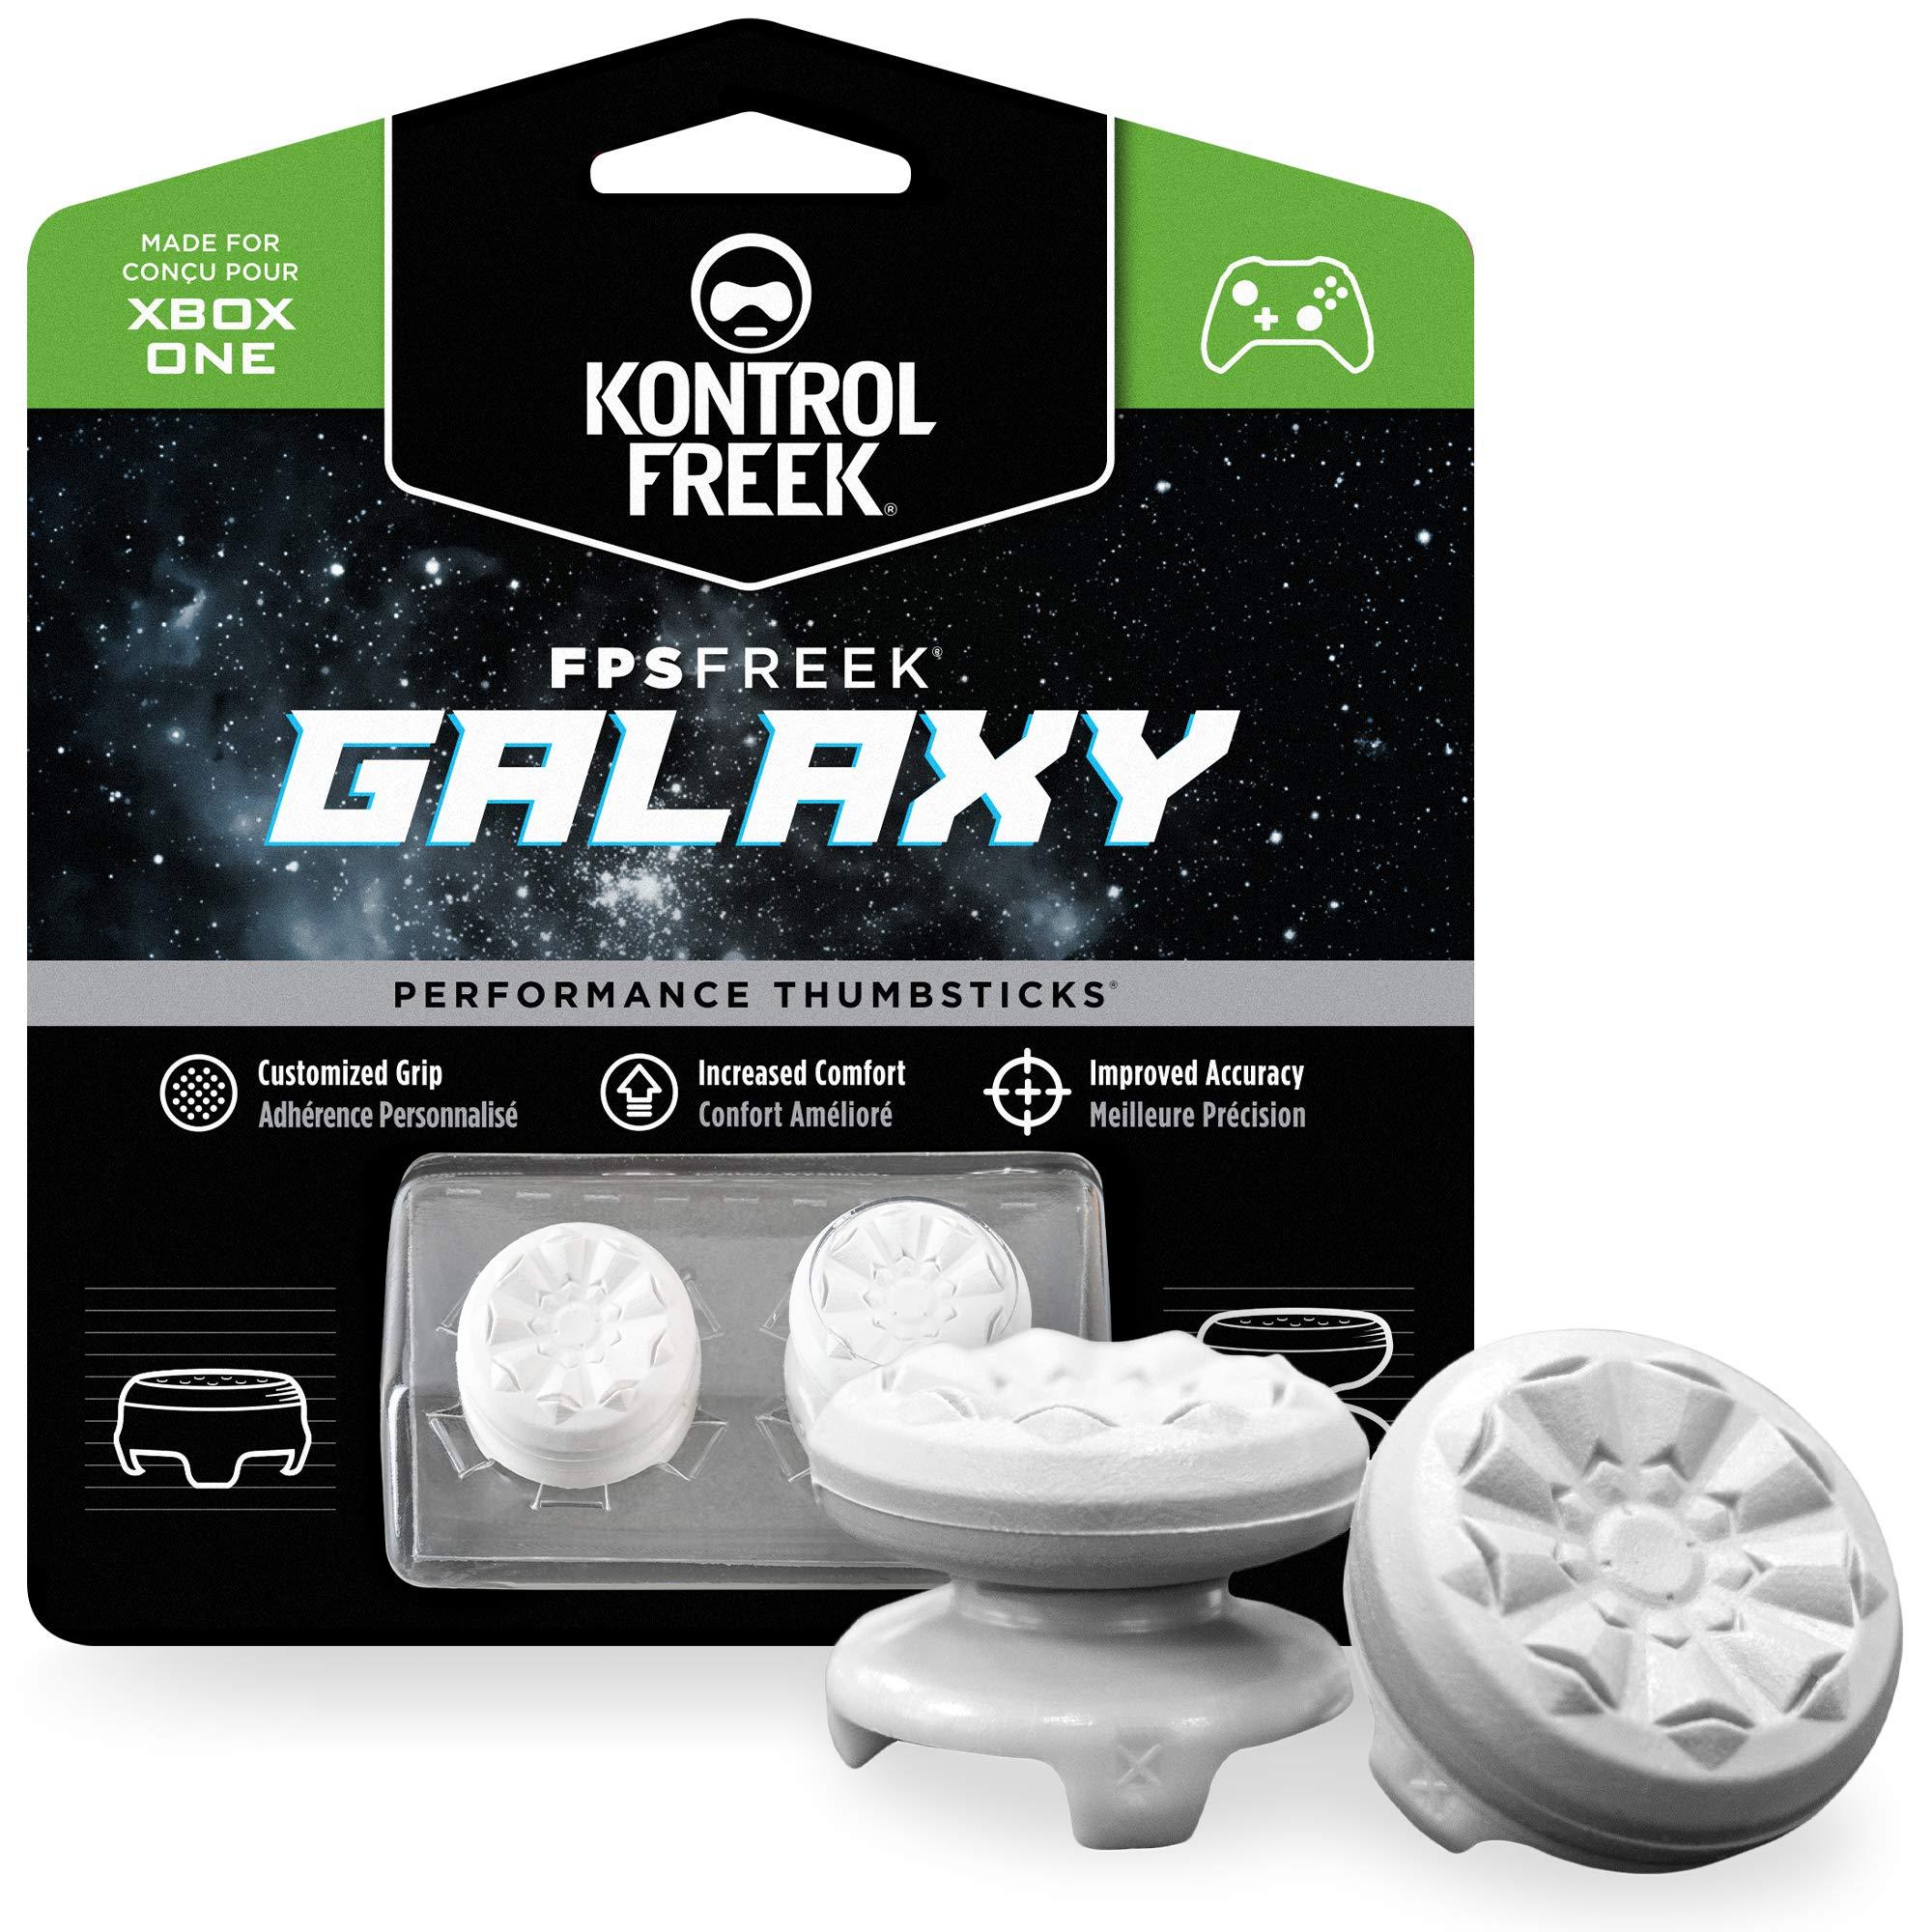 KontrolFreek Freek Galaxy Performance Thumbsticks Controller